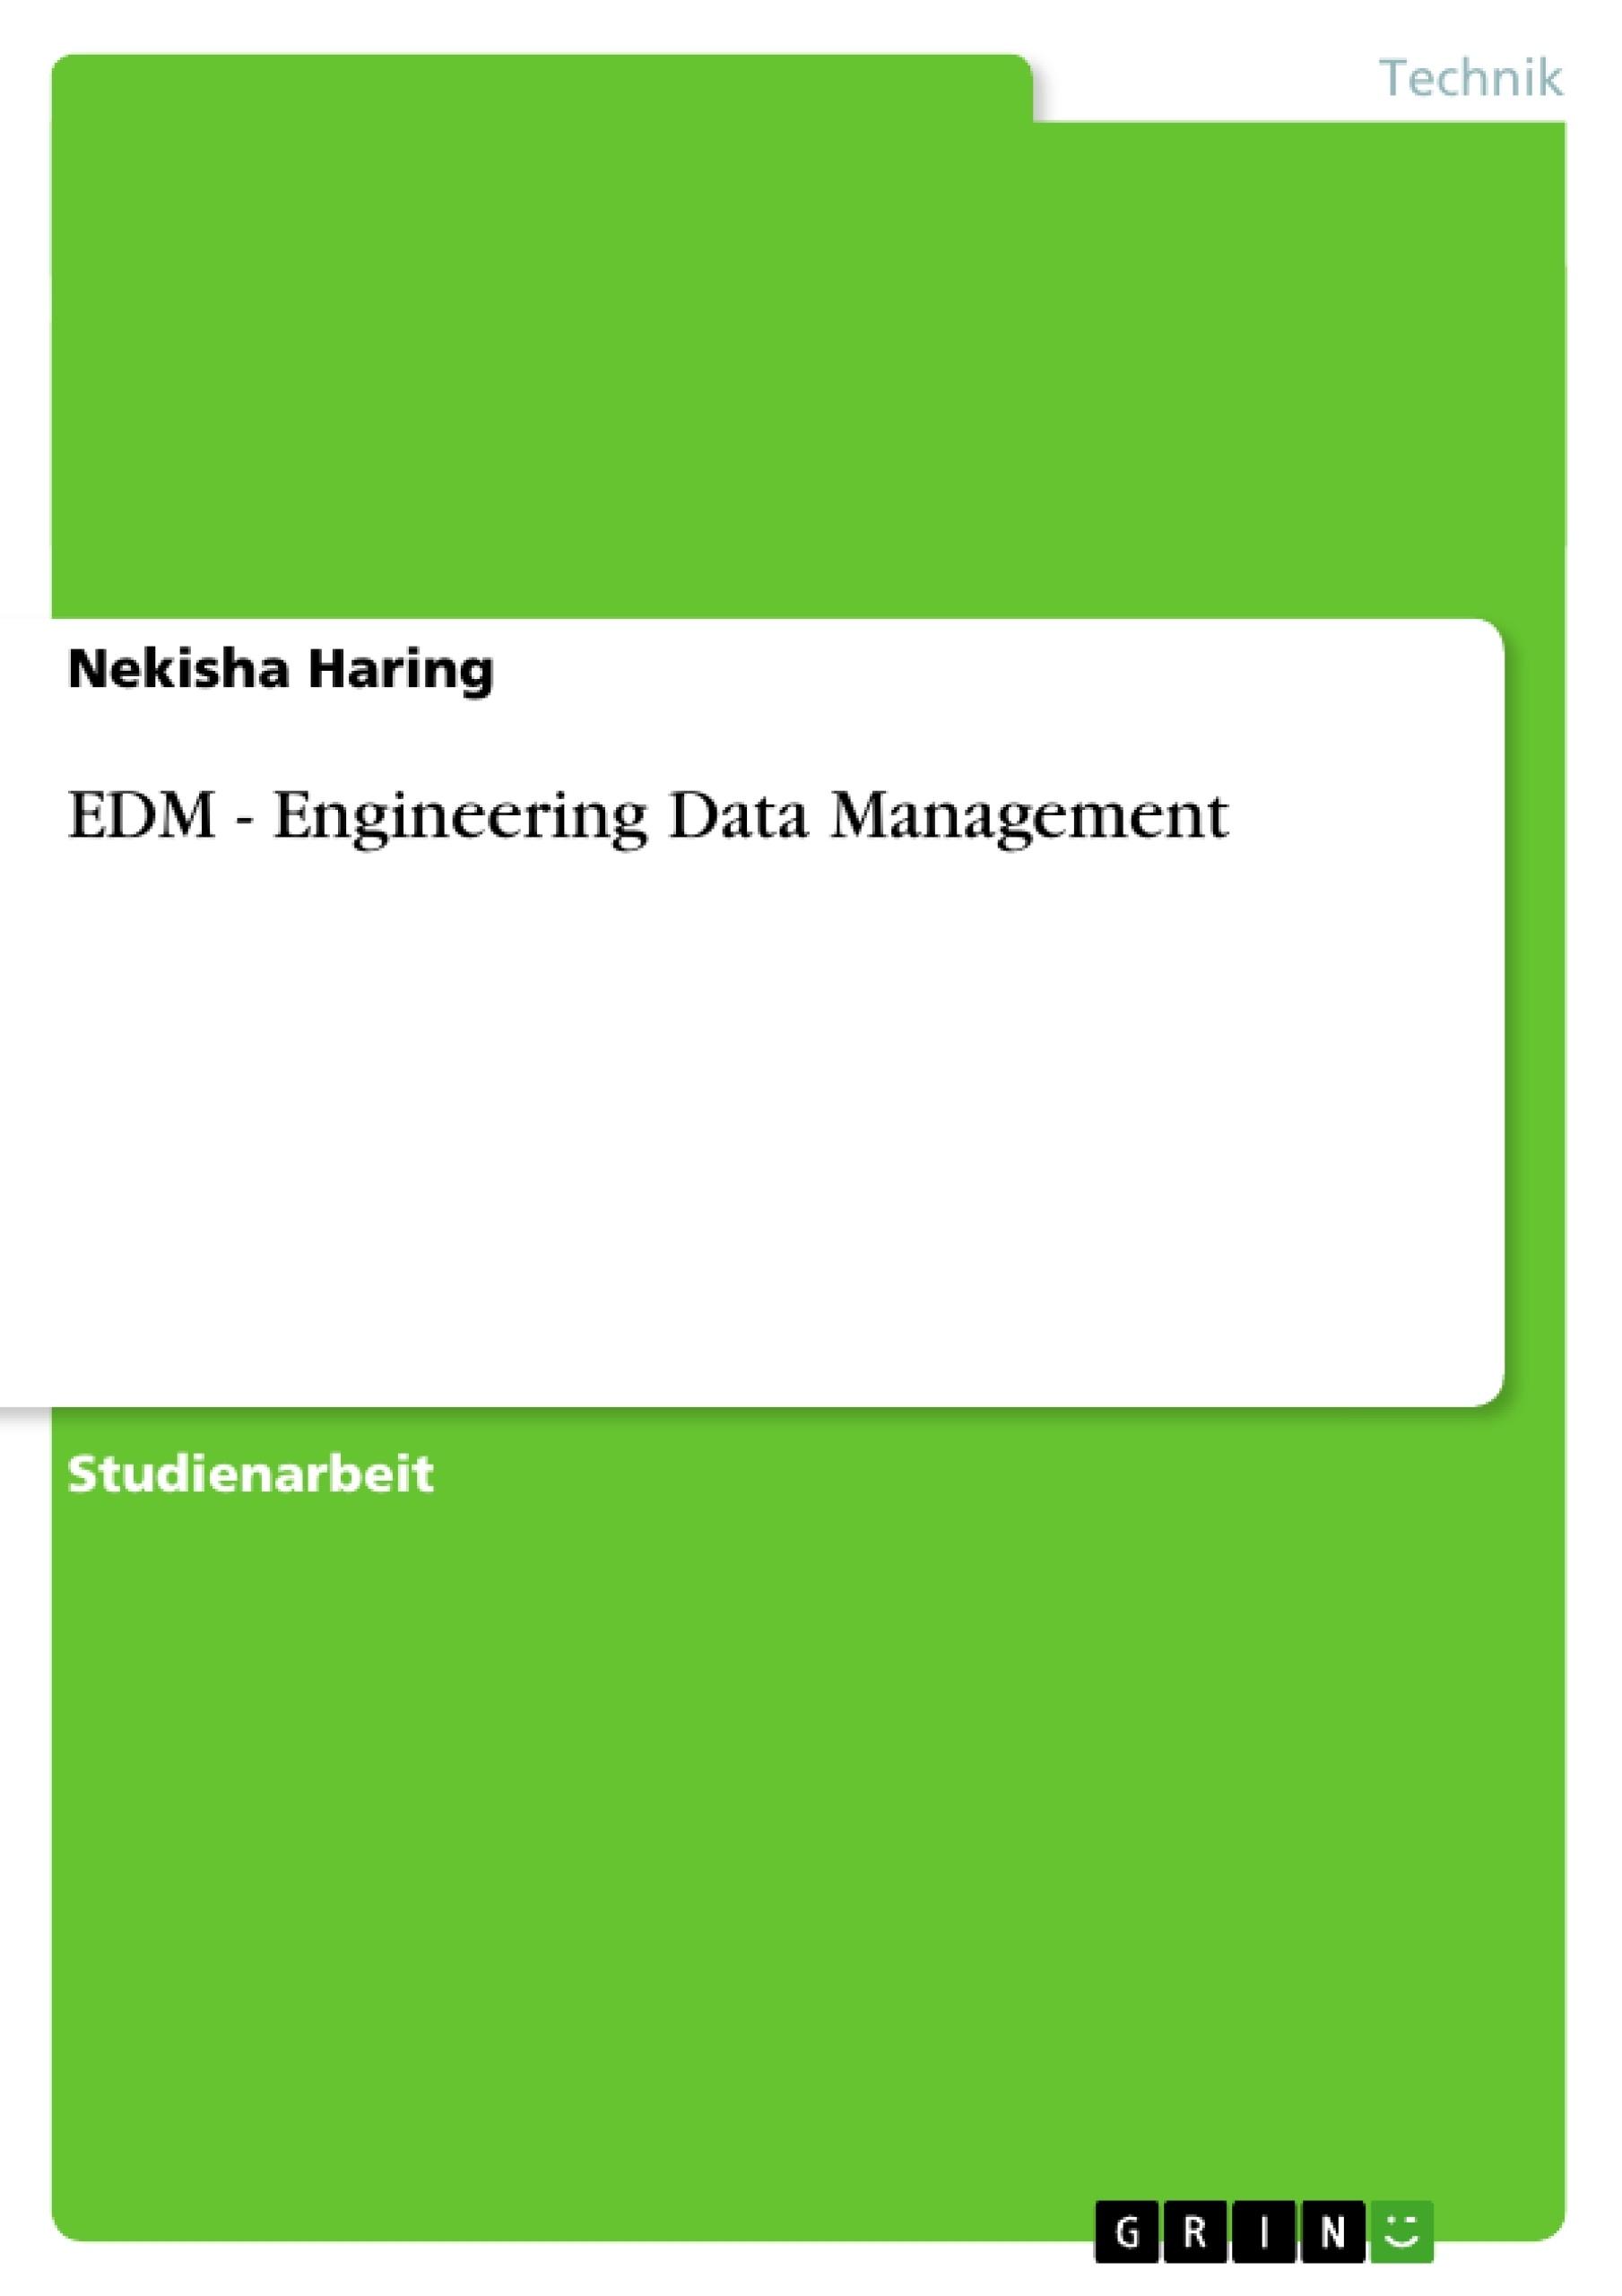 Titel: EDM - Engineering Data Management